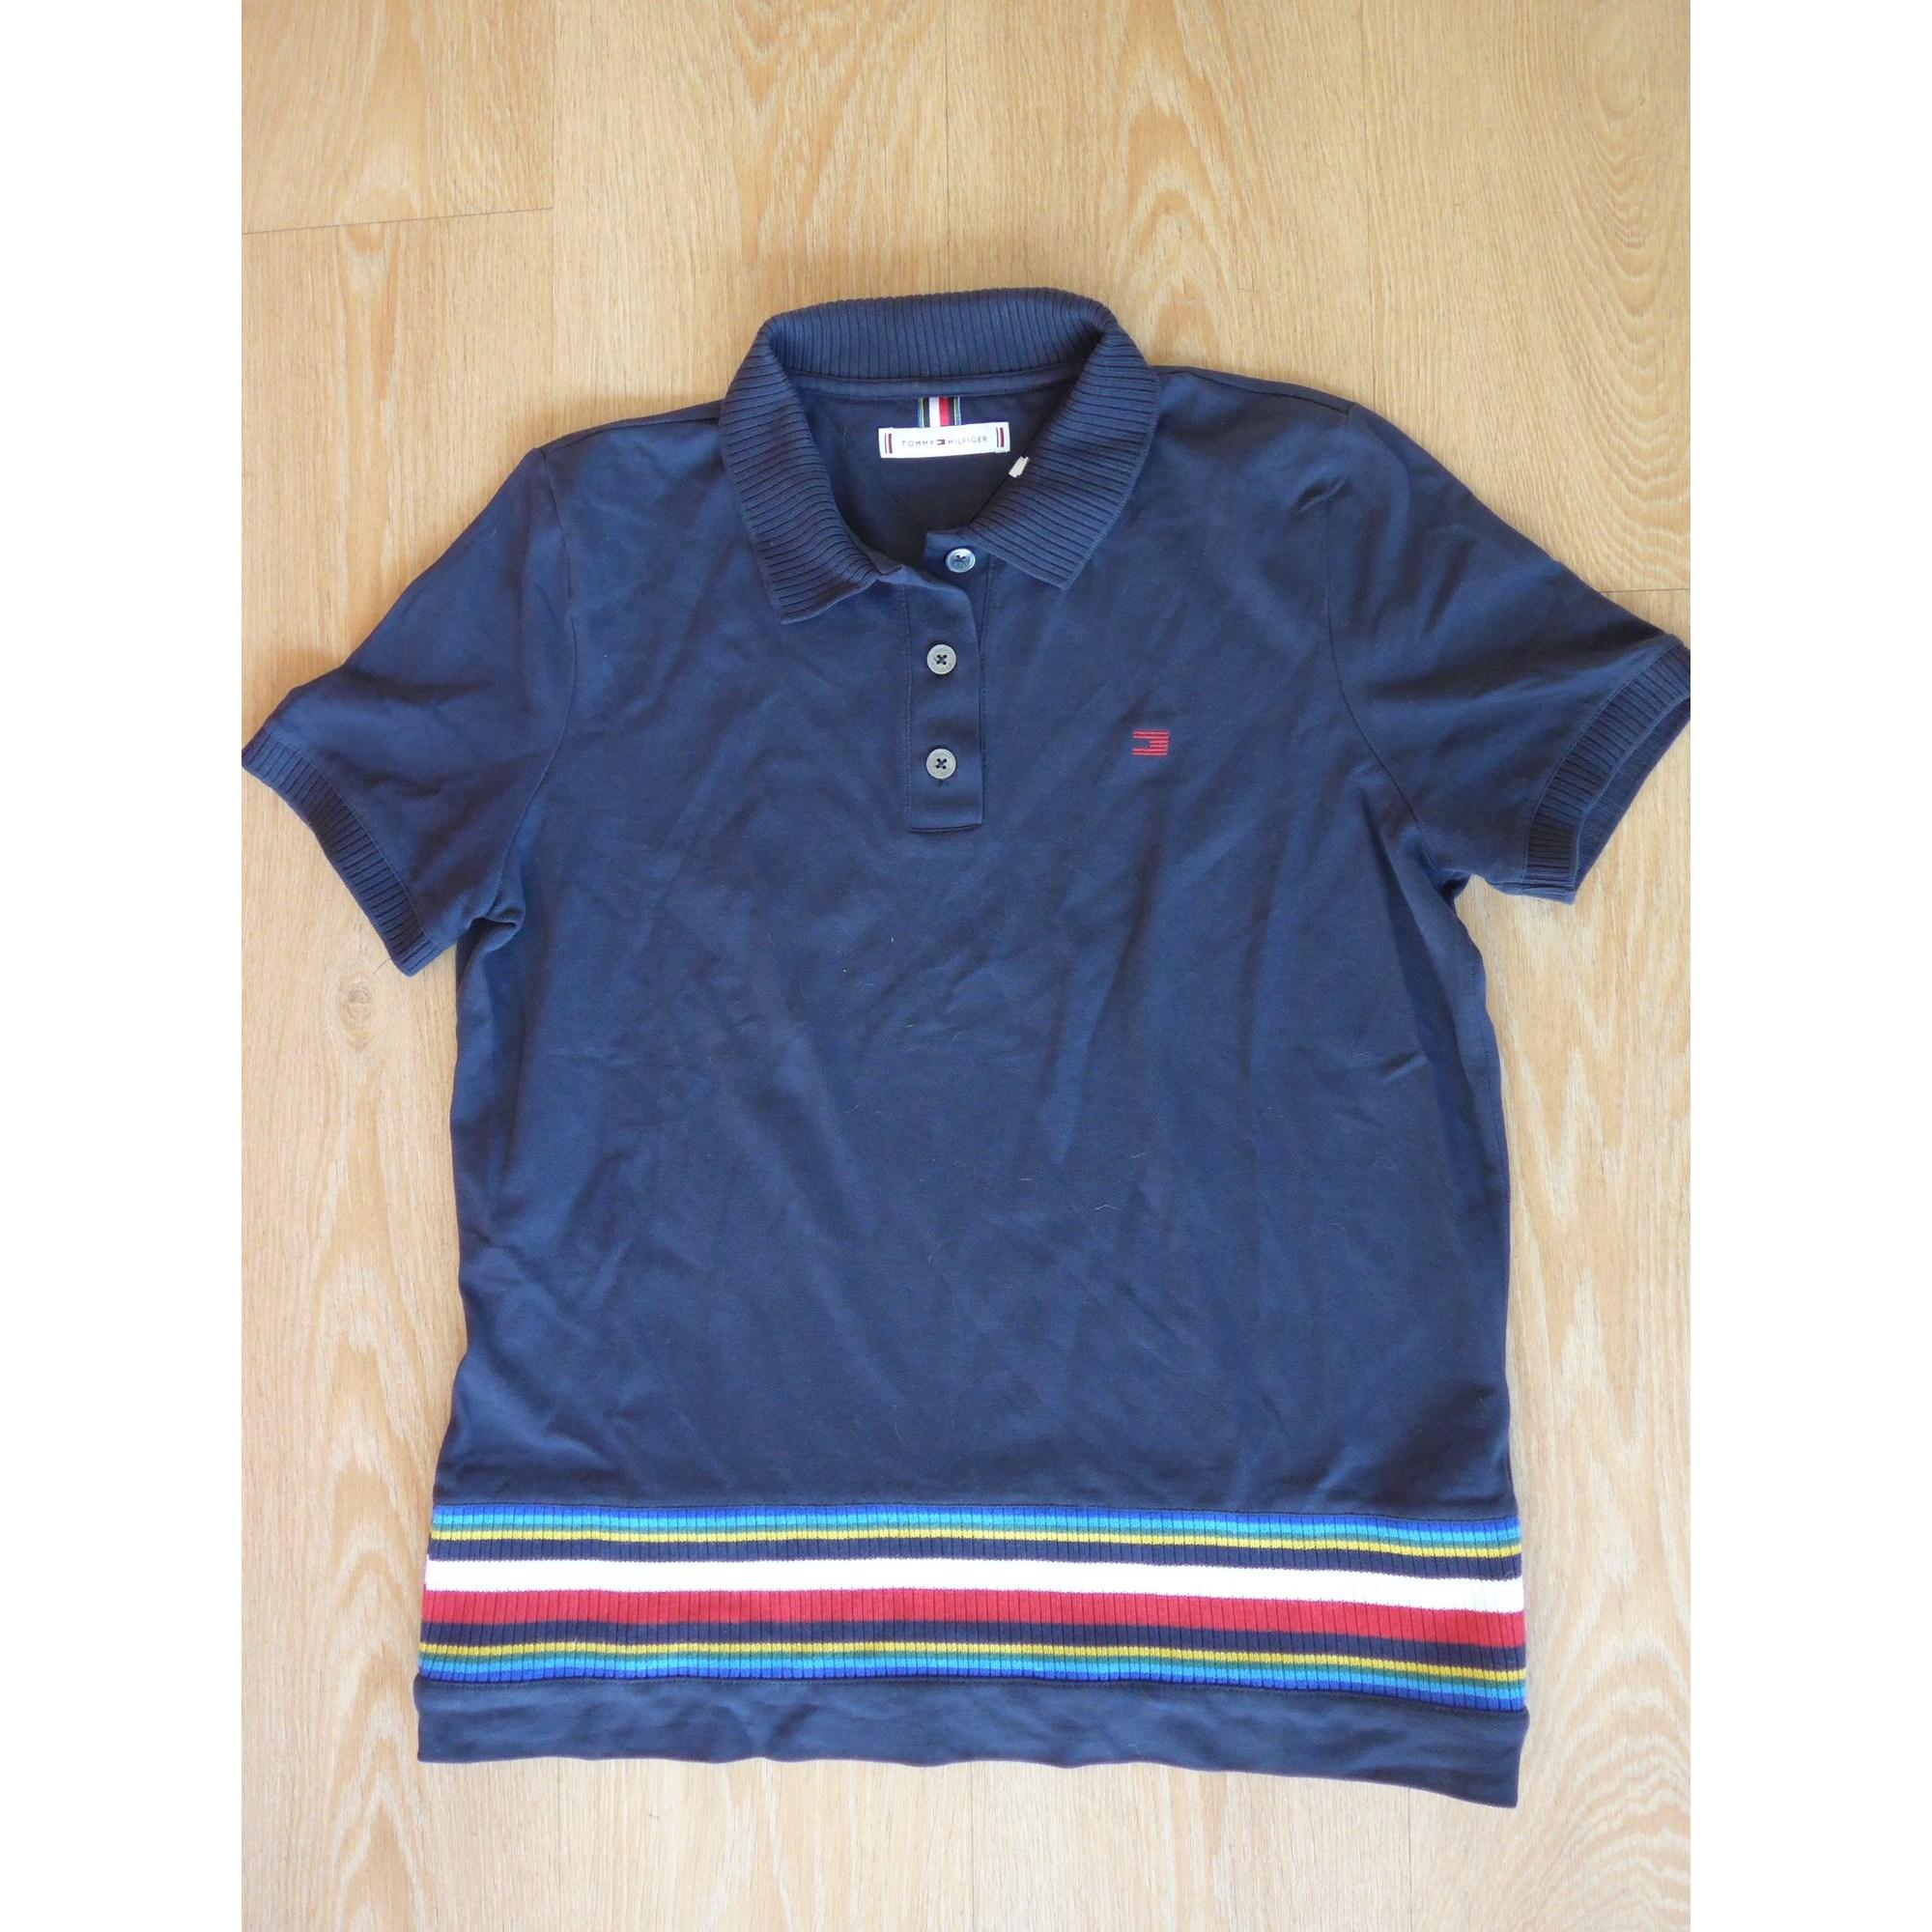 Polo TOMMY HILFIGER Bleu, bleu marine, bleu turquoise